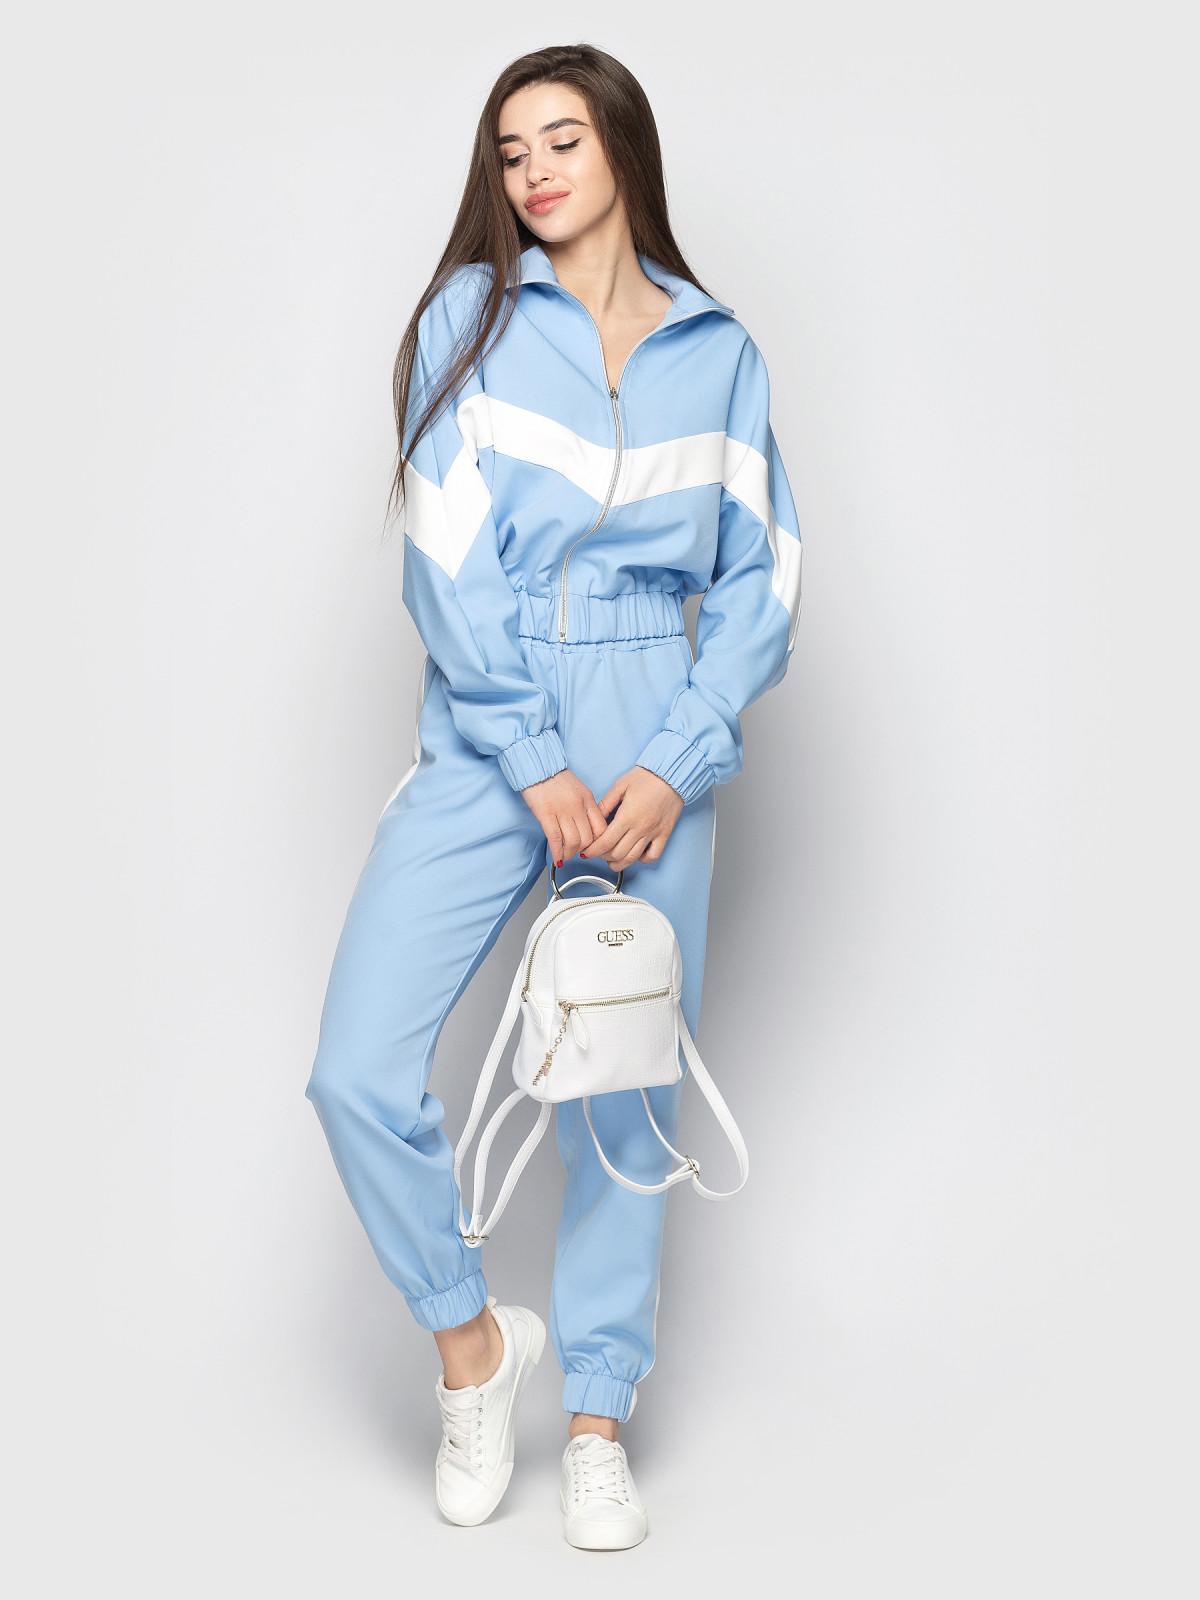 Спортивный костюм Freedom голубой-белый